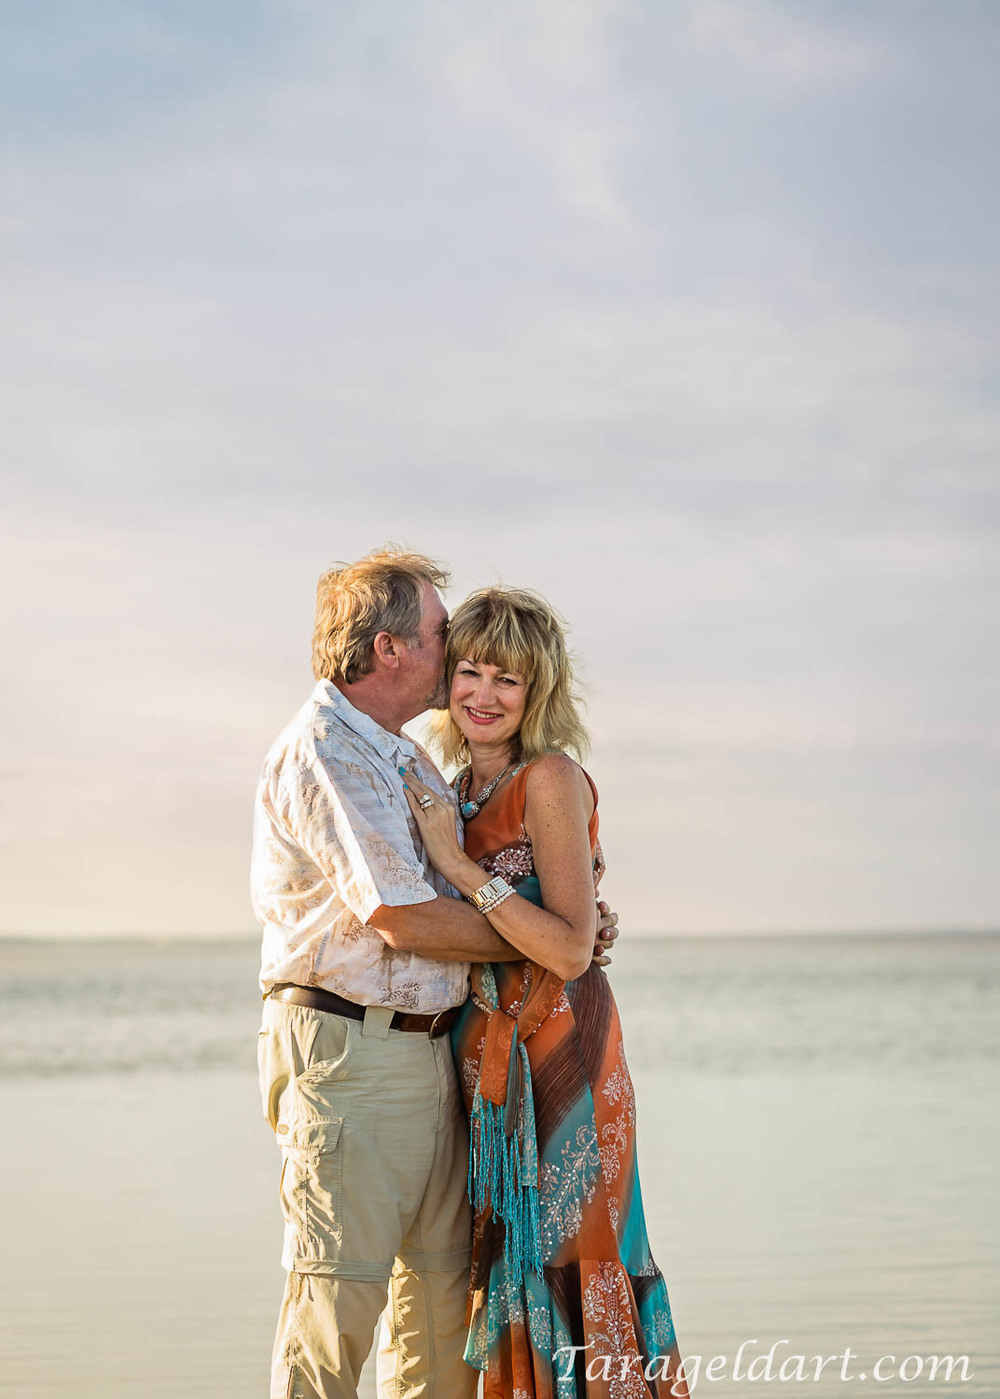 Moncton Family Photographer~ Tara Geldart-2-7.jpg